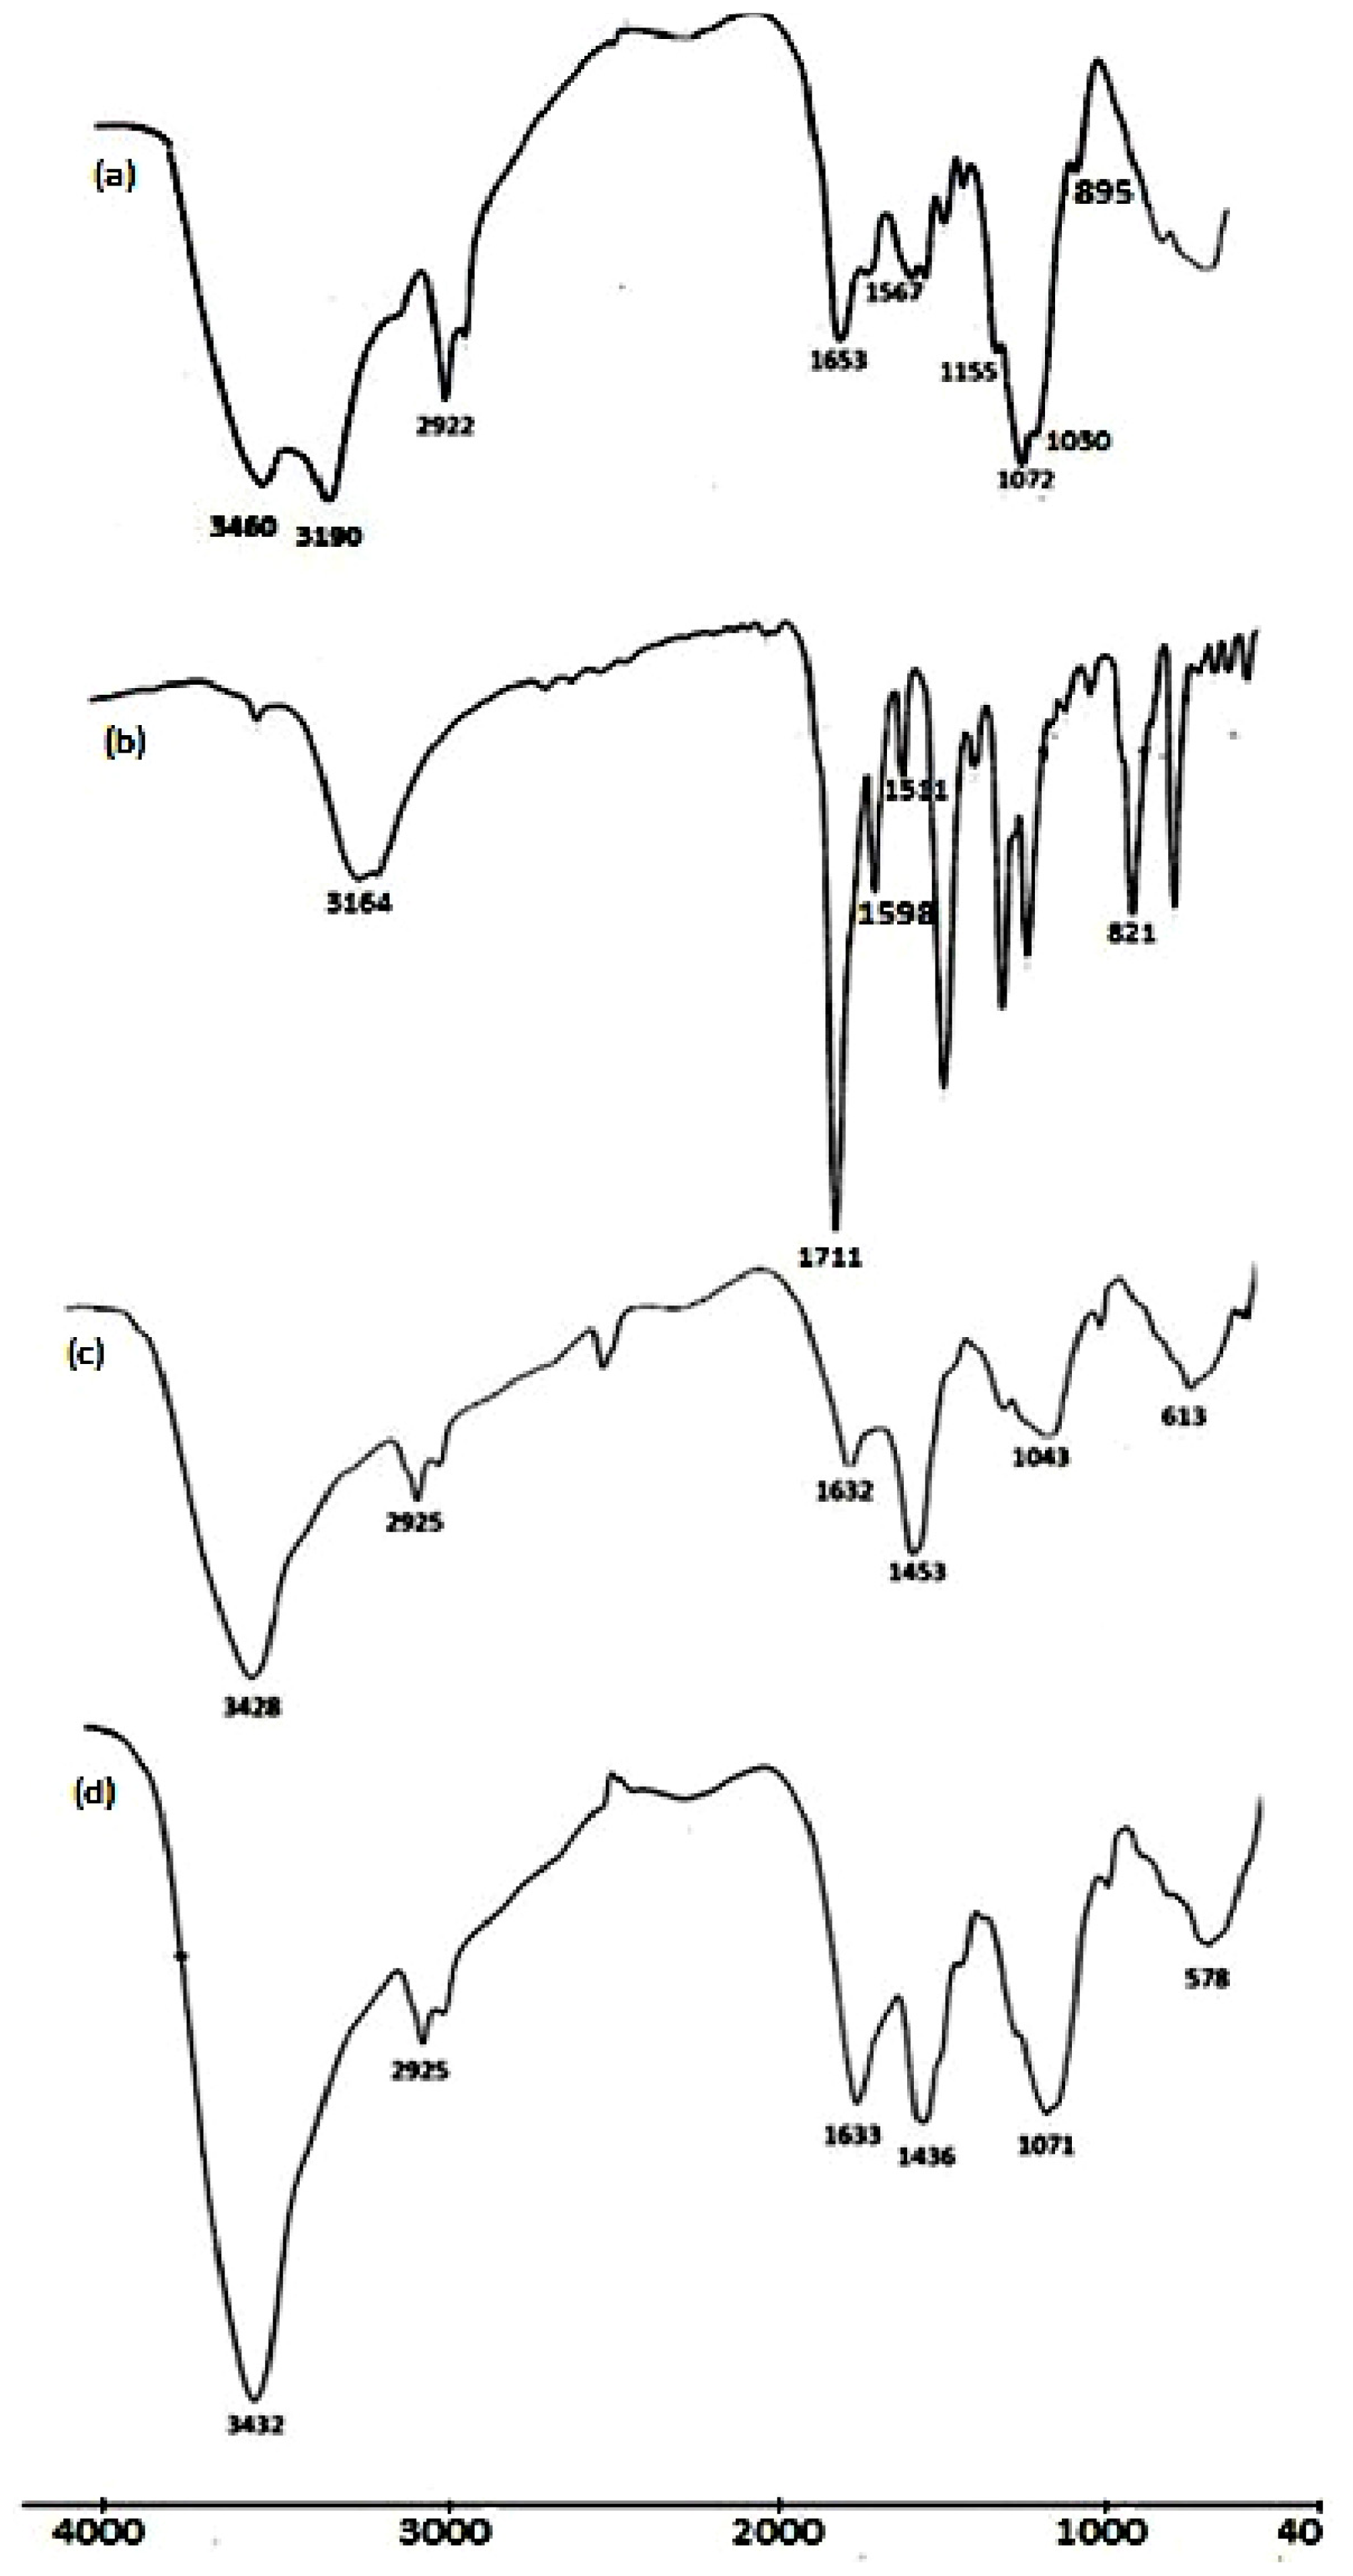 download Ontology and Economics: Tony Lawson and His Critics 2008